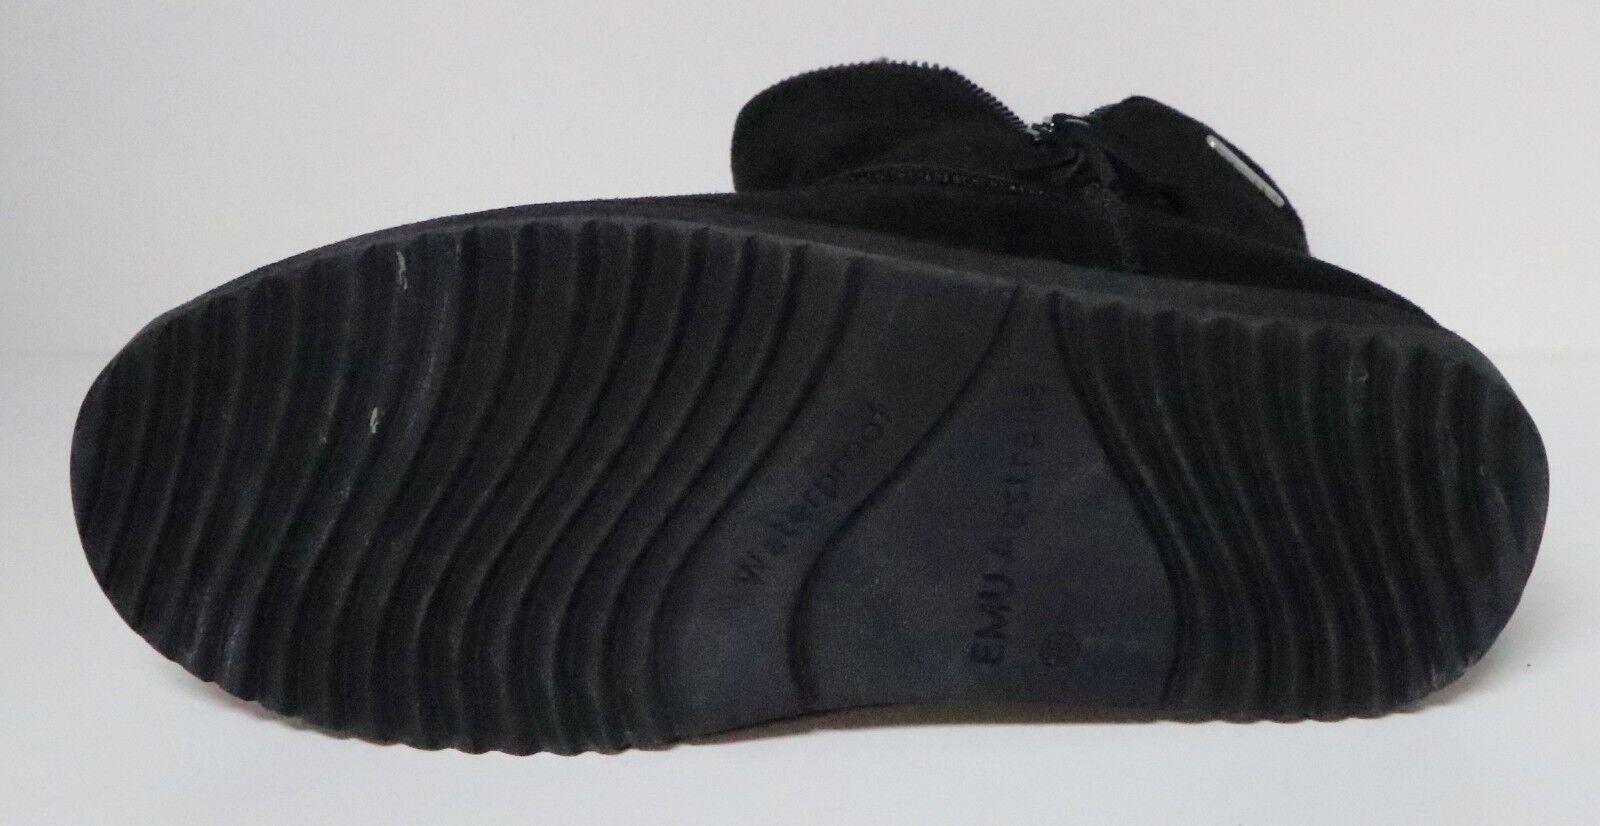 EMU AUSTRALIA DEEPWATER MINI femmes WATERPROOF SHEEPSKIN ANKLE bottes bottes bottes W11251 34f41a